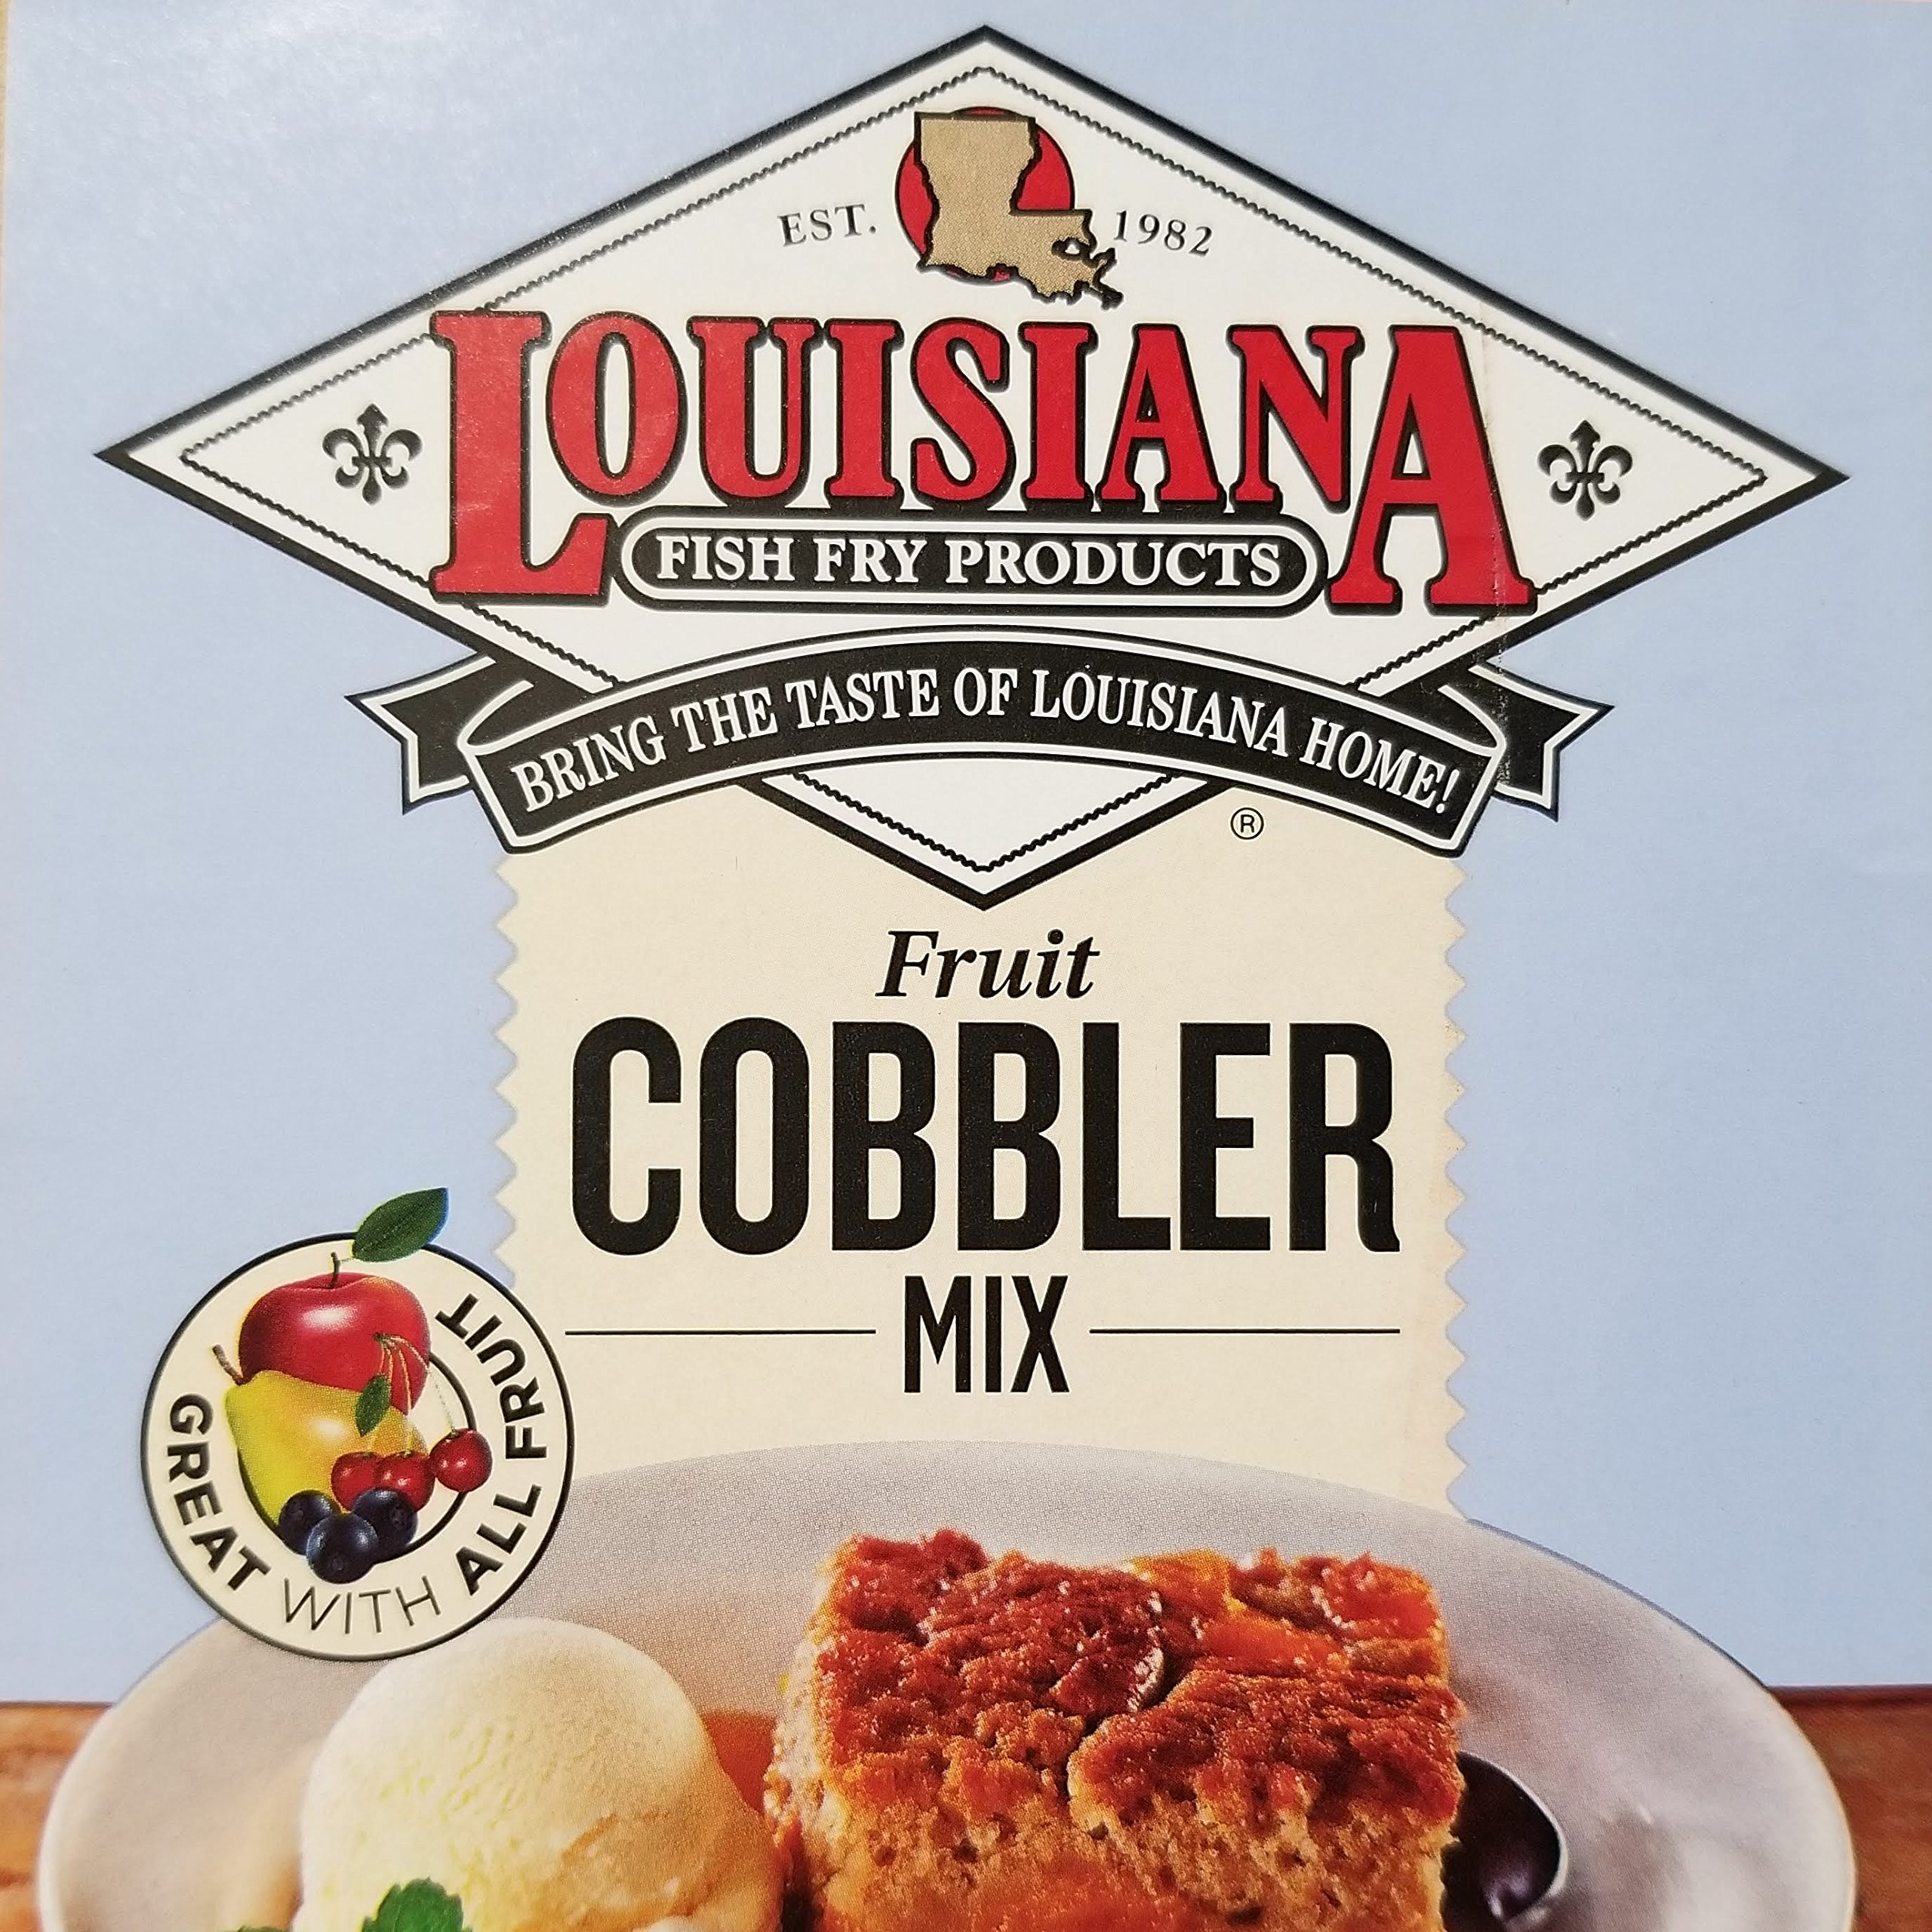 Louisiana Fish Fry Southern Fruit Cobbler Mix 2lb Package - Makes 10 8oz Servings